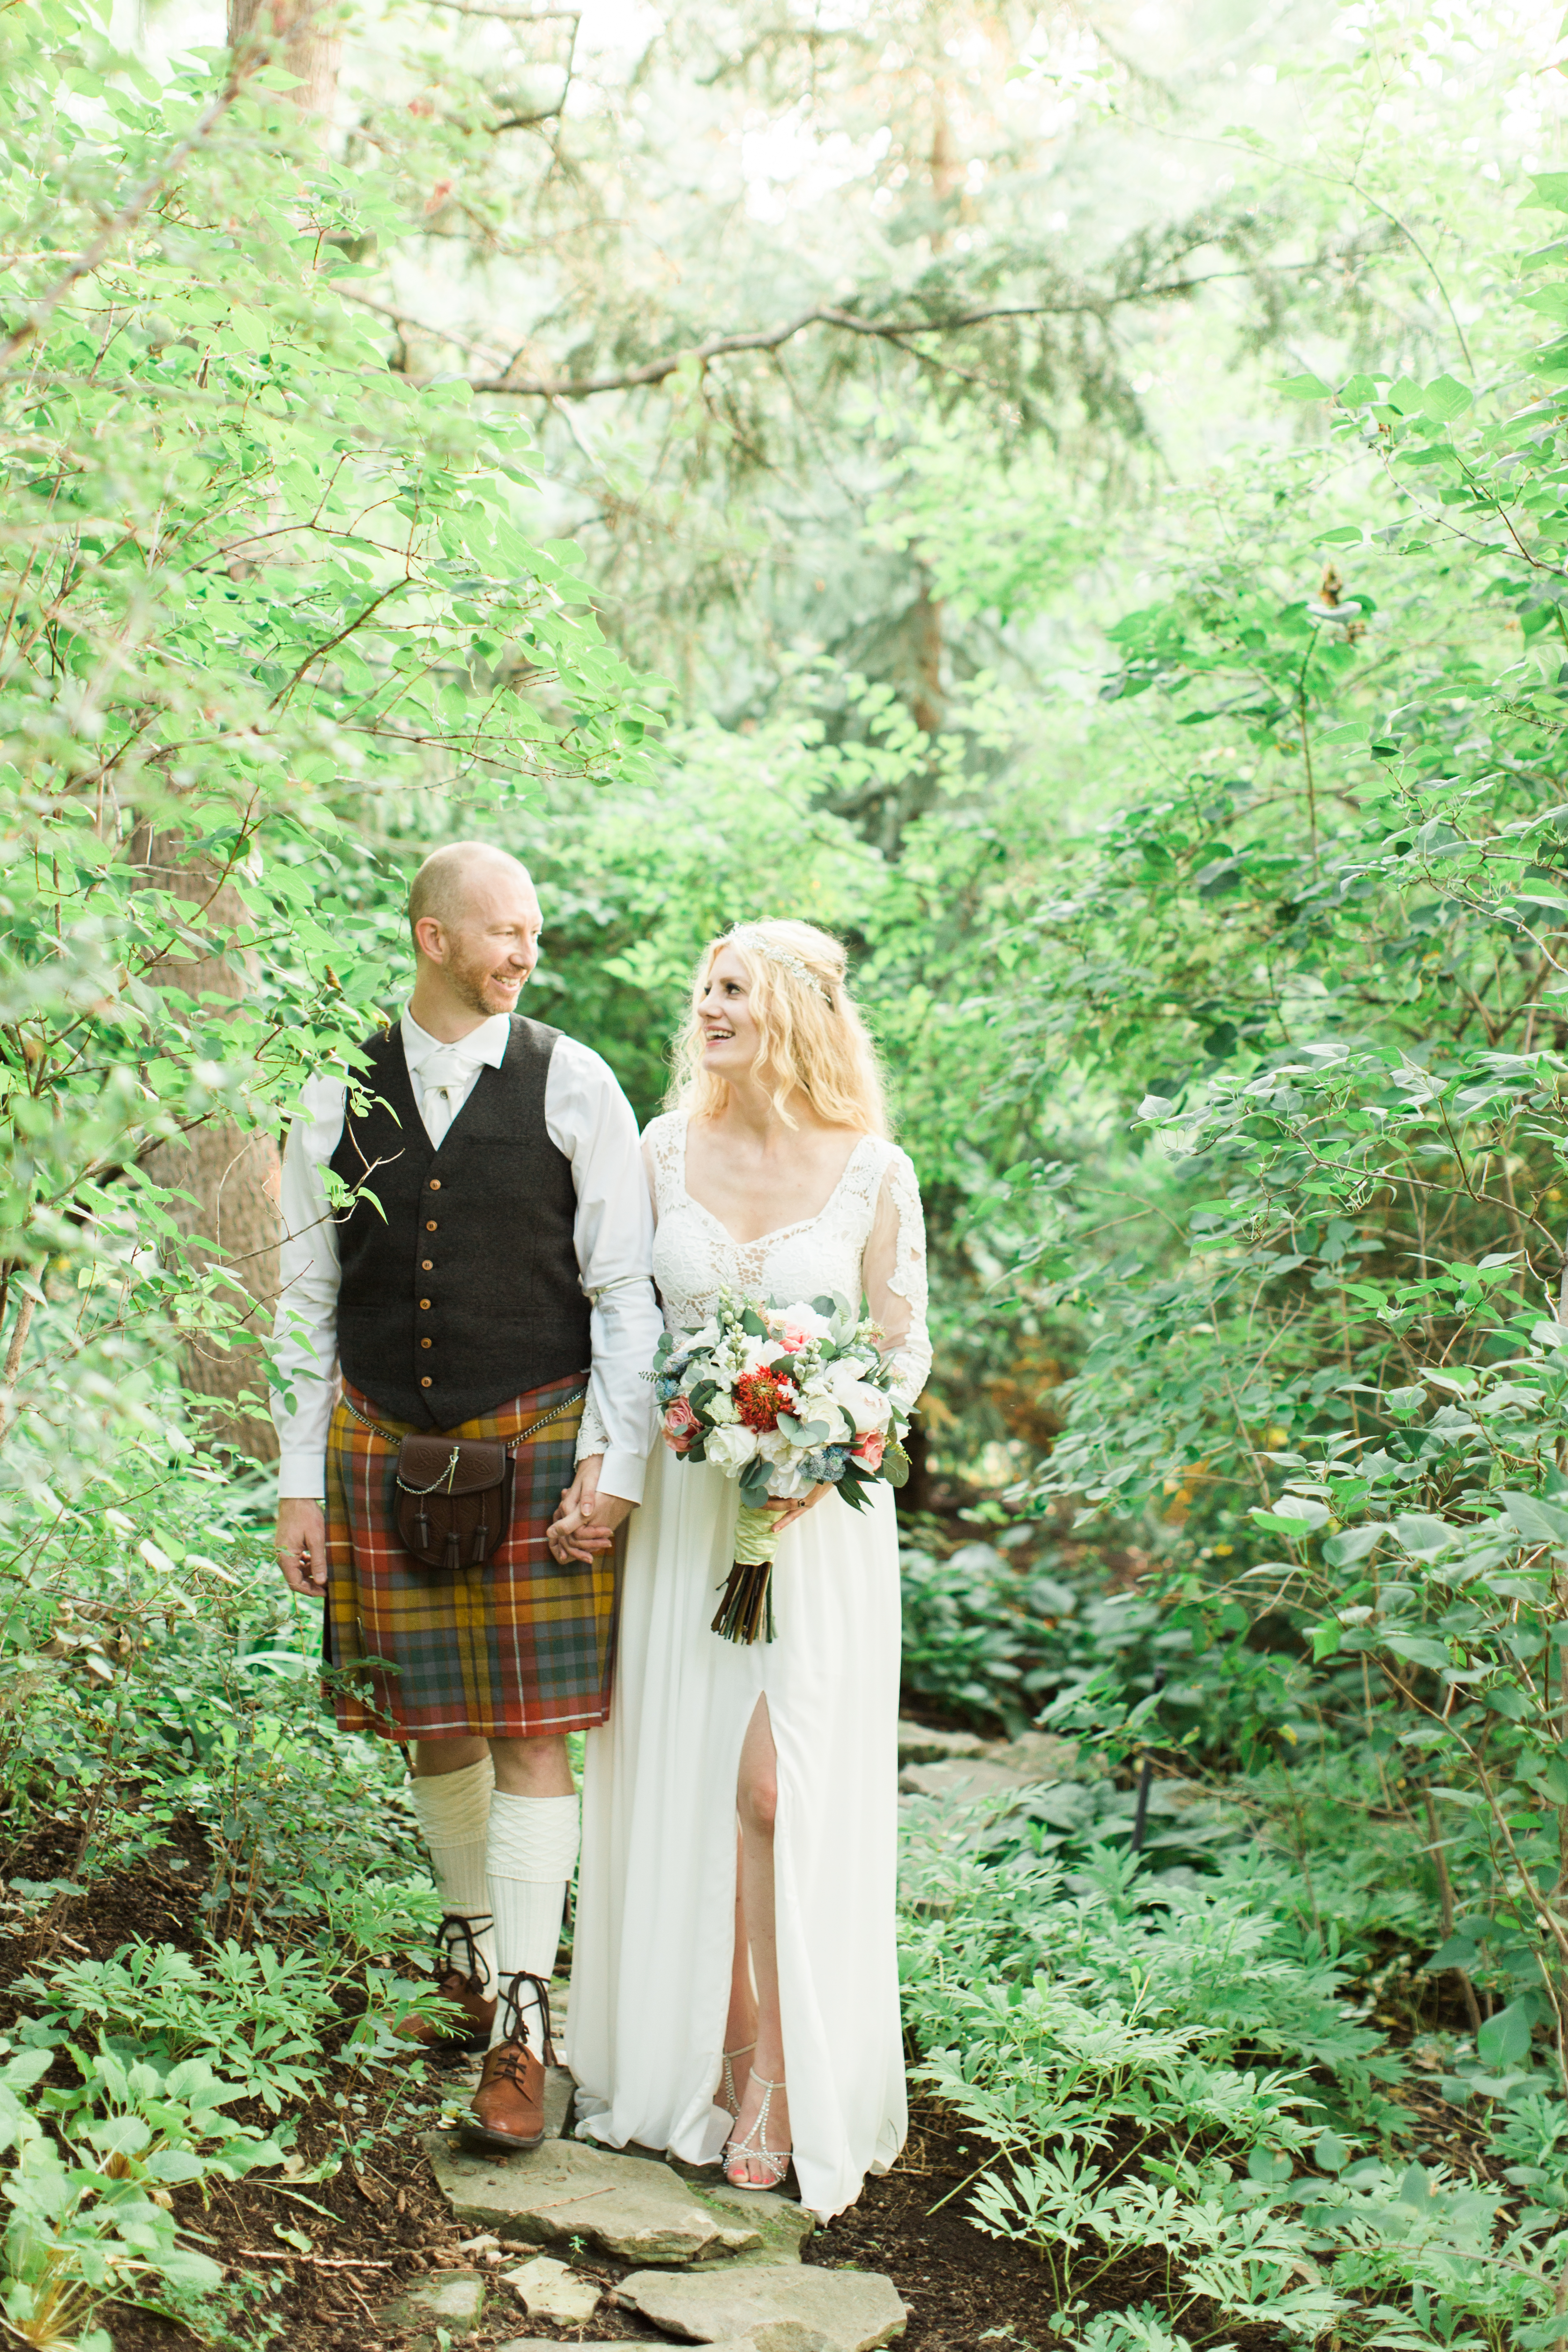 Calgary Wedding Photographer Reader Rock Garden Cafe Golden Light Light Airy Fairy - 23